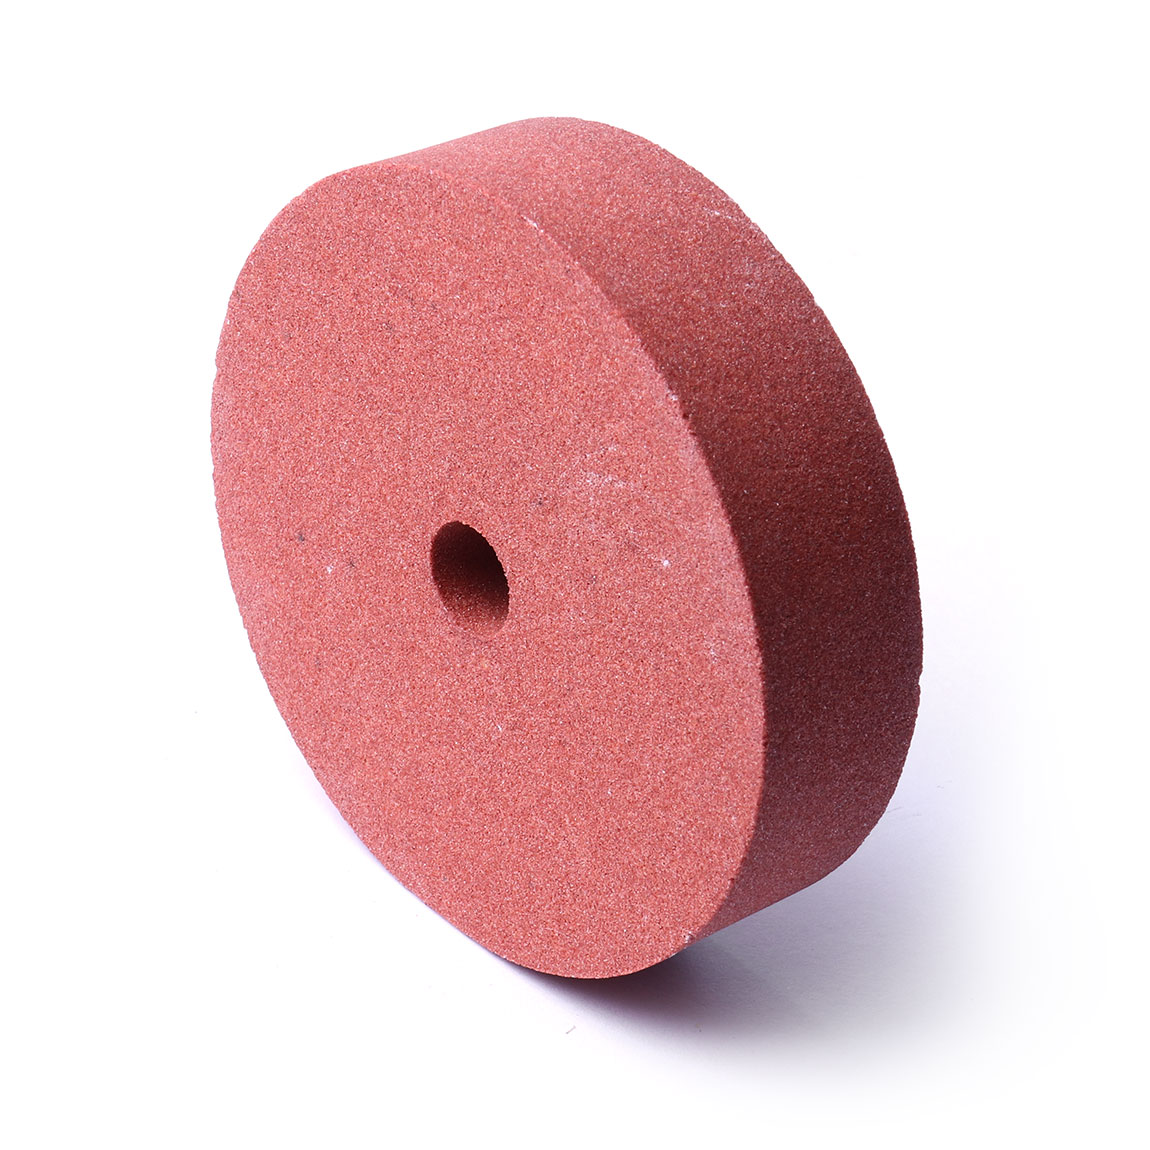 1 PCS Grinding Wheel Abrasive Disc Polishing Metal Stone Wheel For Bench Grinders